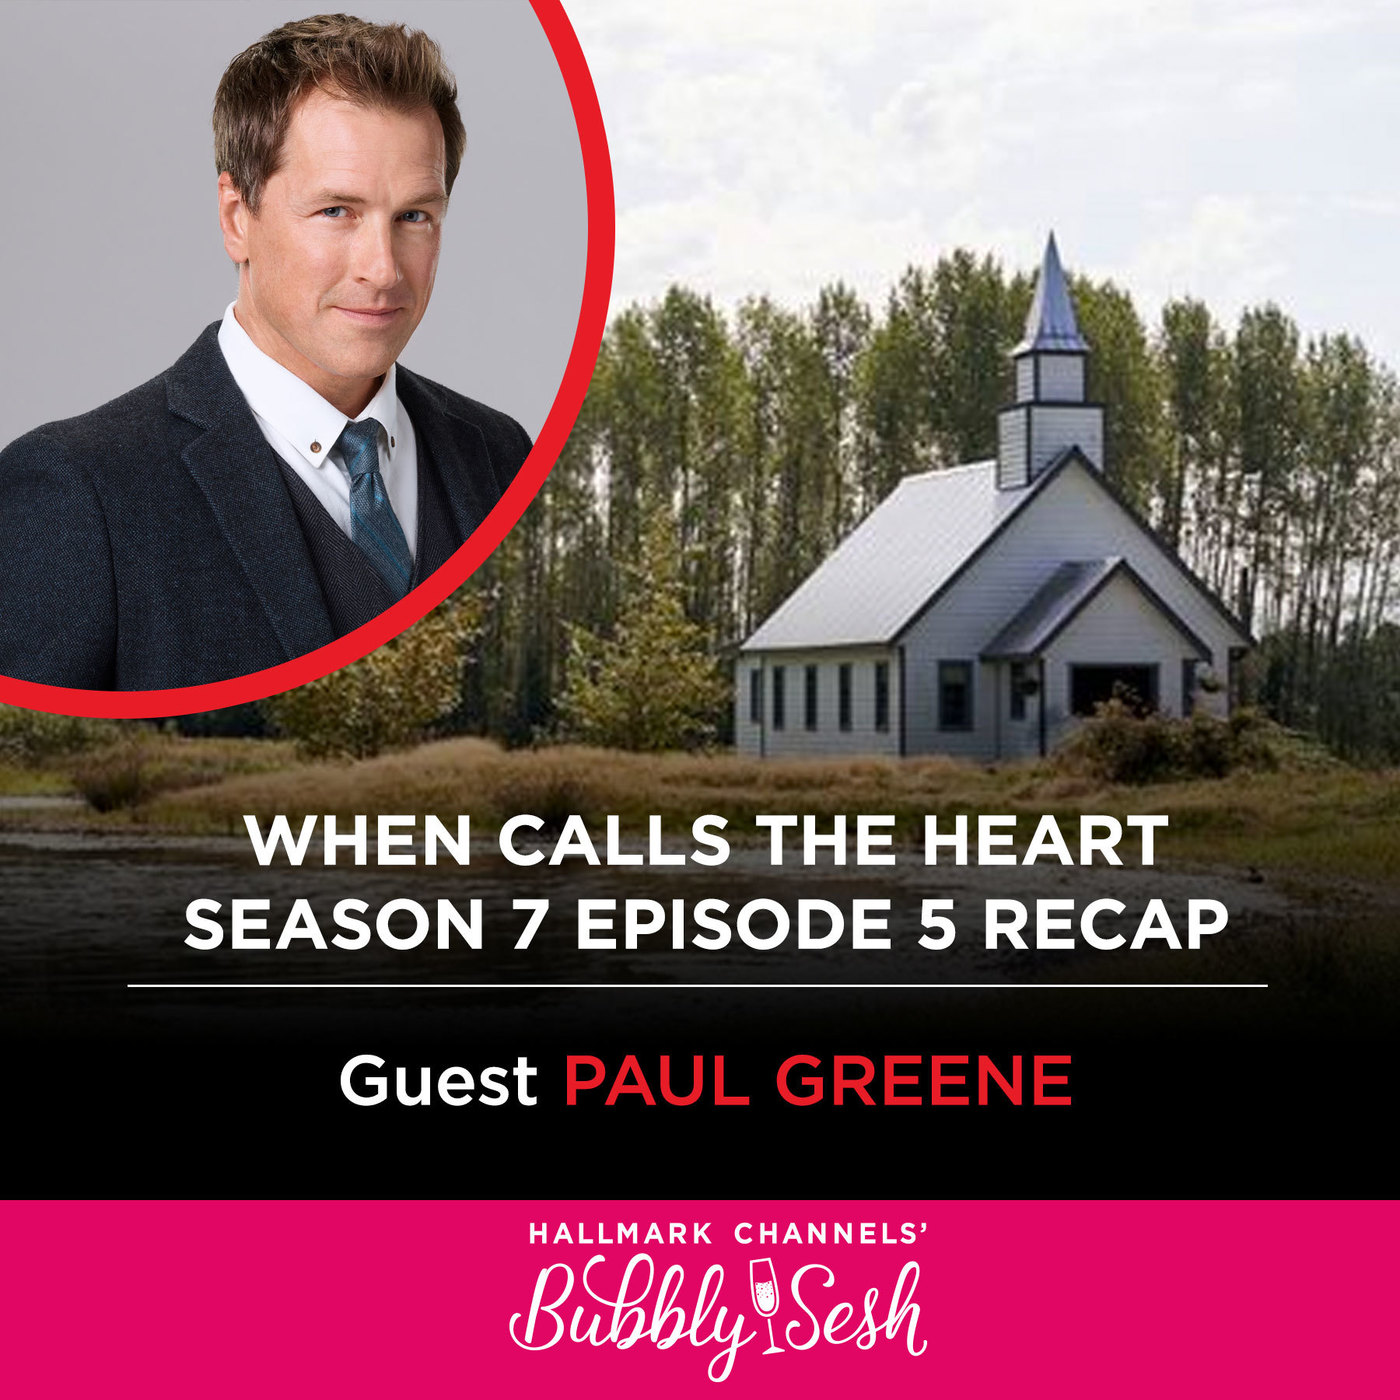 When Calls the Heart Season 7, Episode 5 Recap with Guest, Paul Greene, Actor